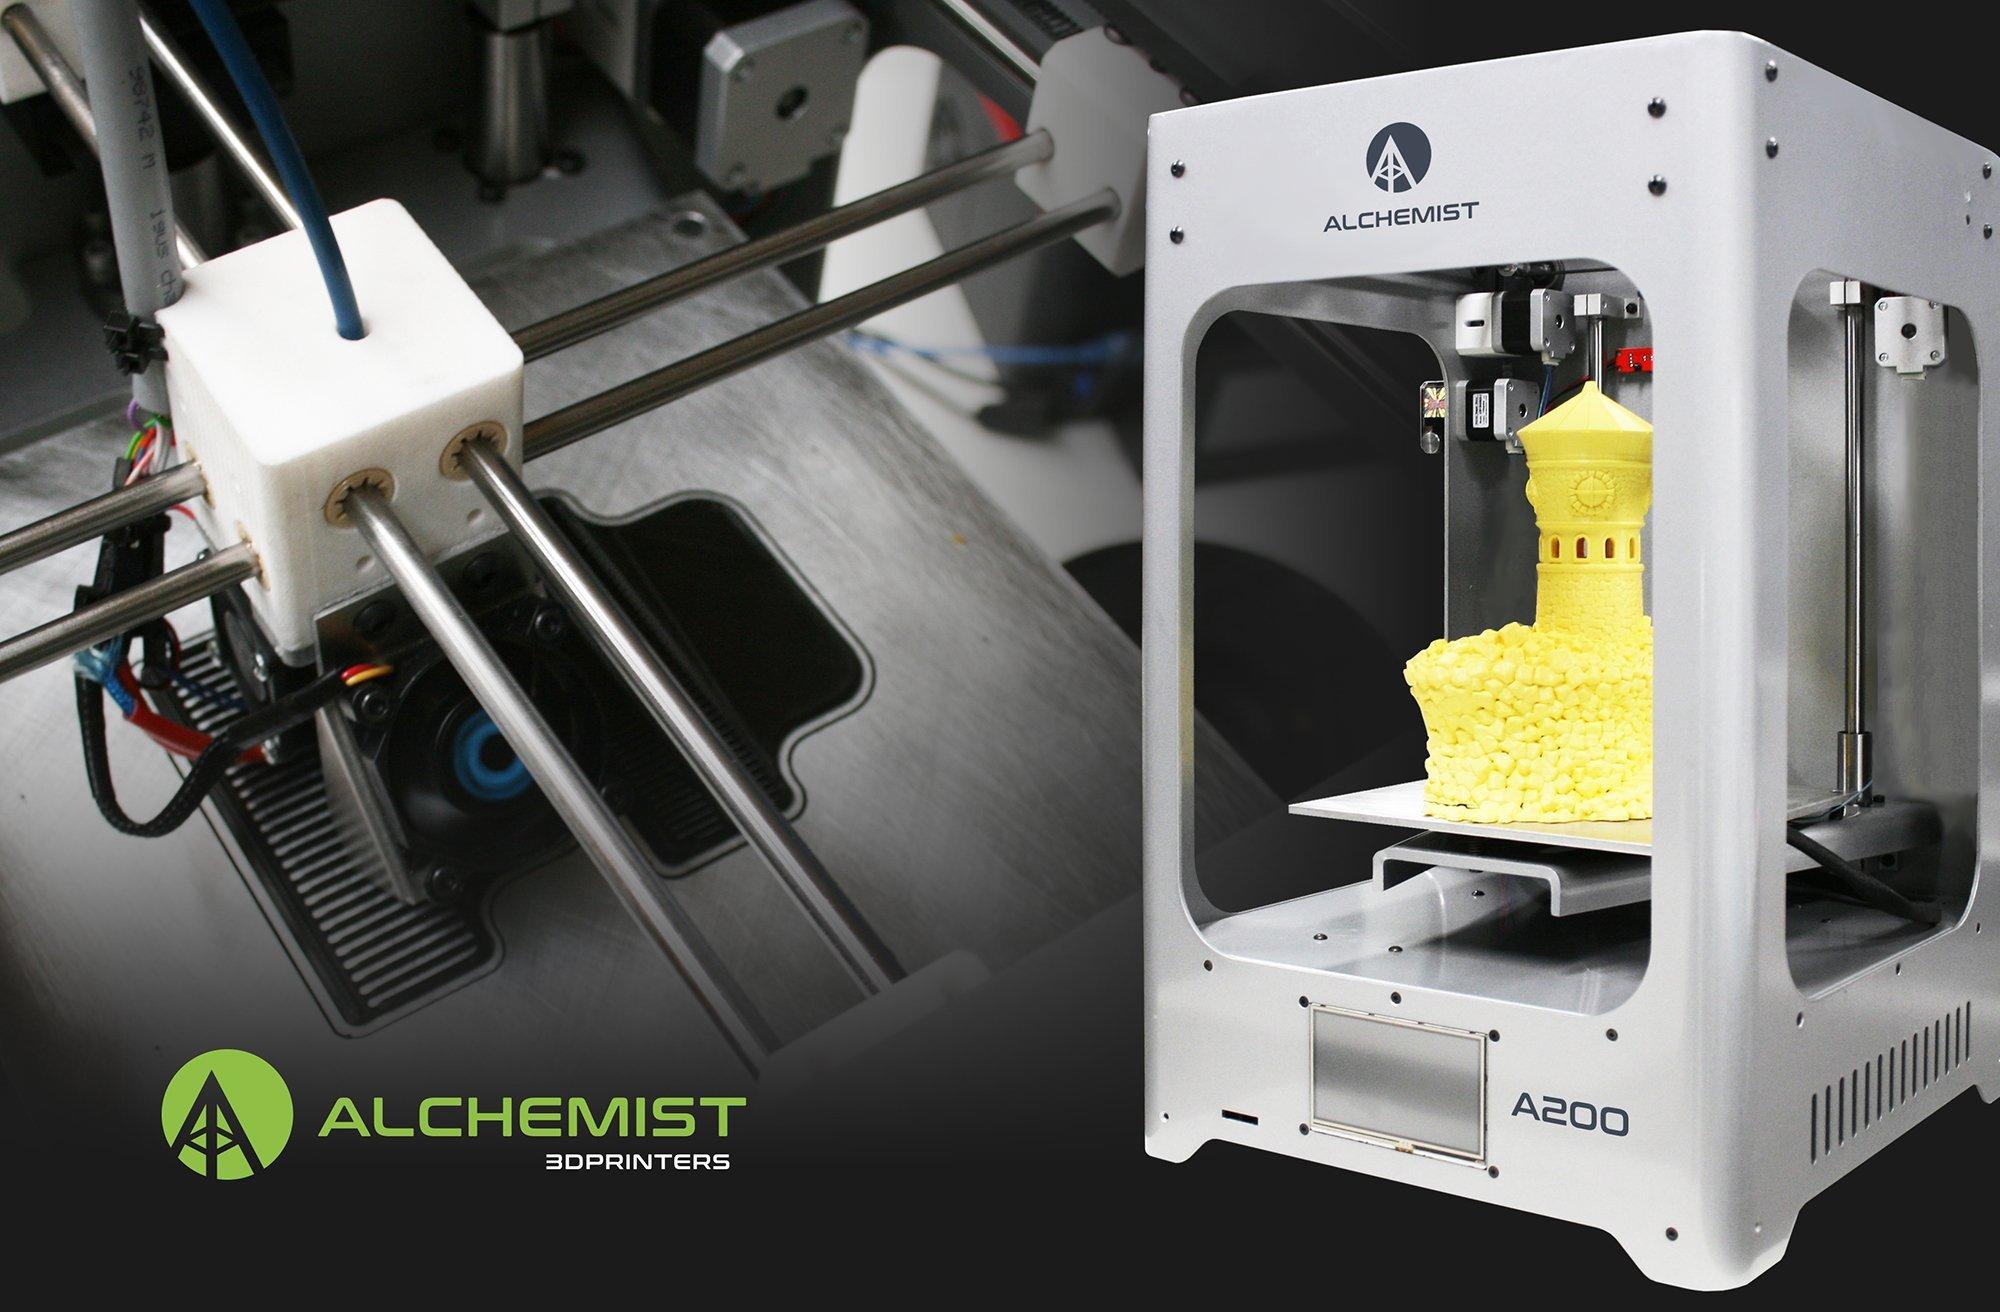 Impresora 3d Alchemist A200